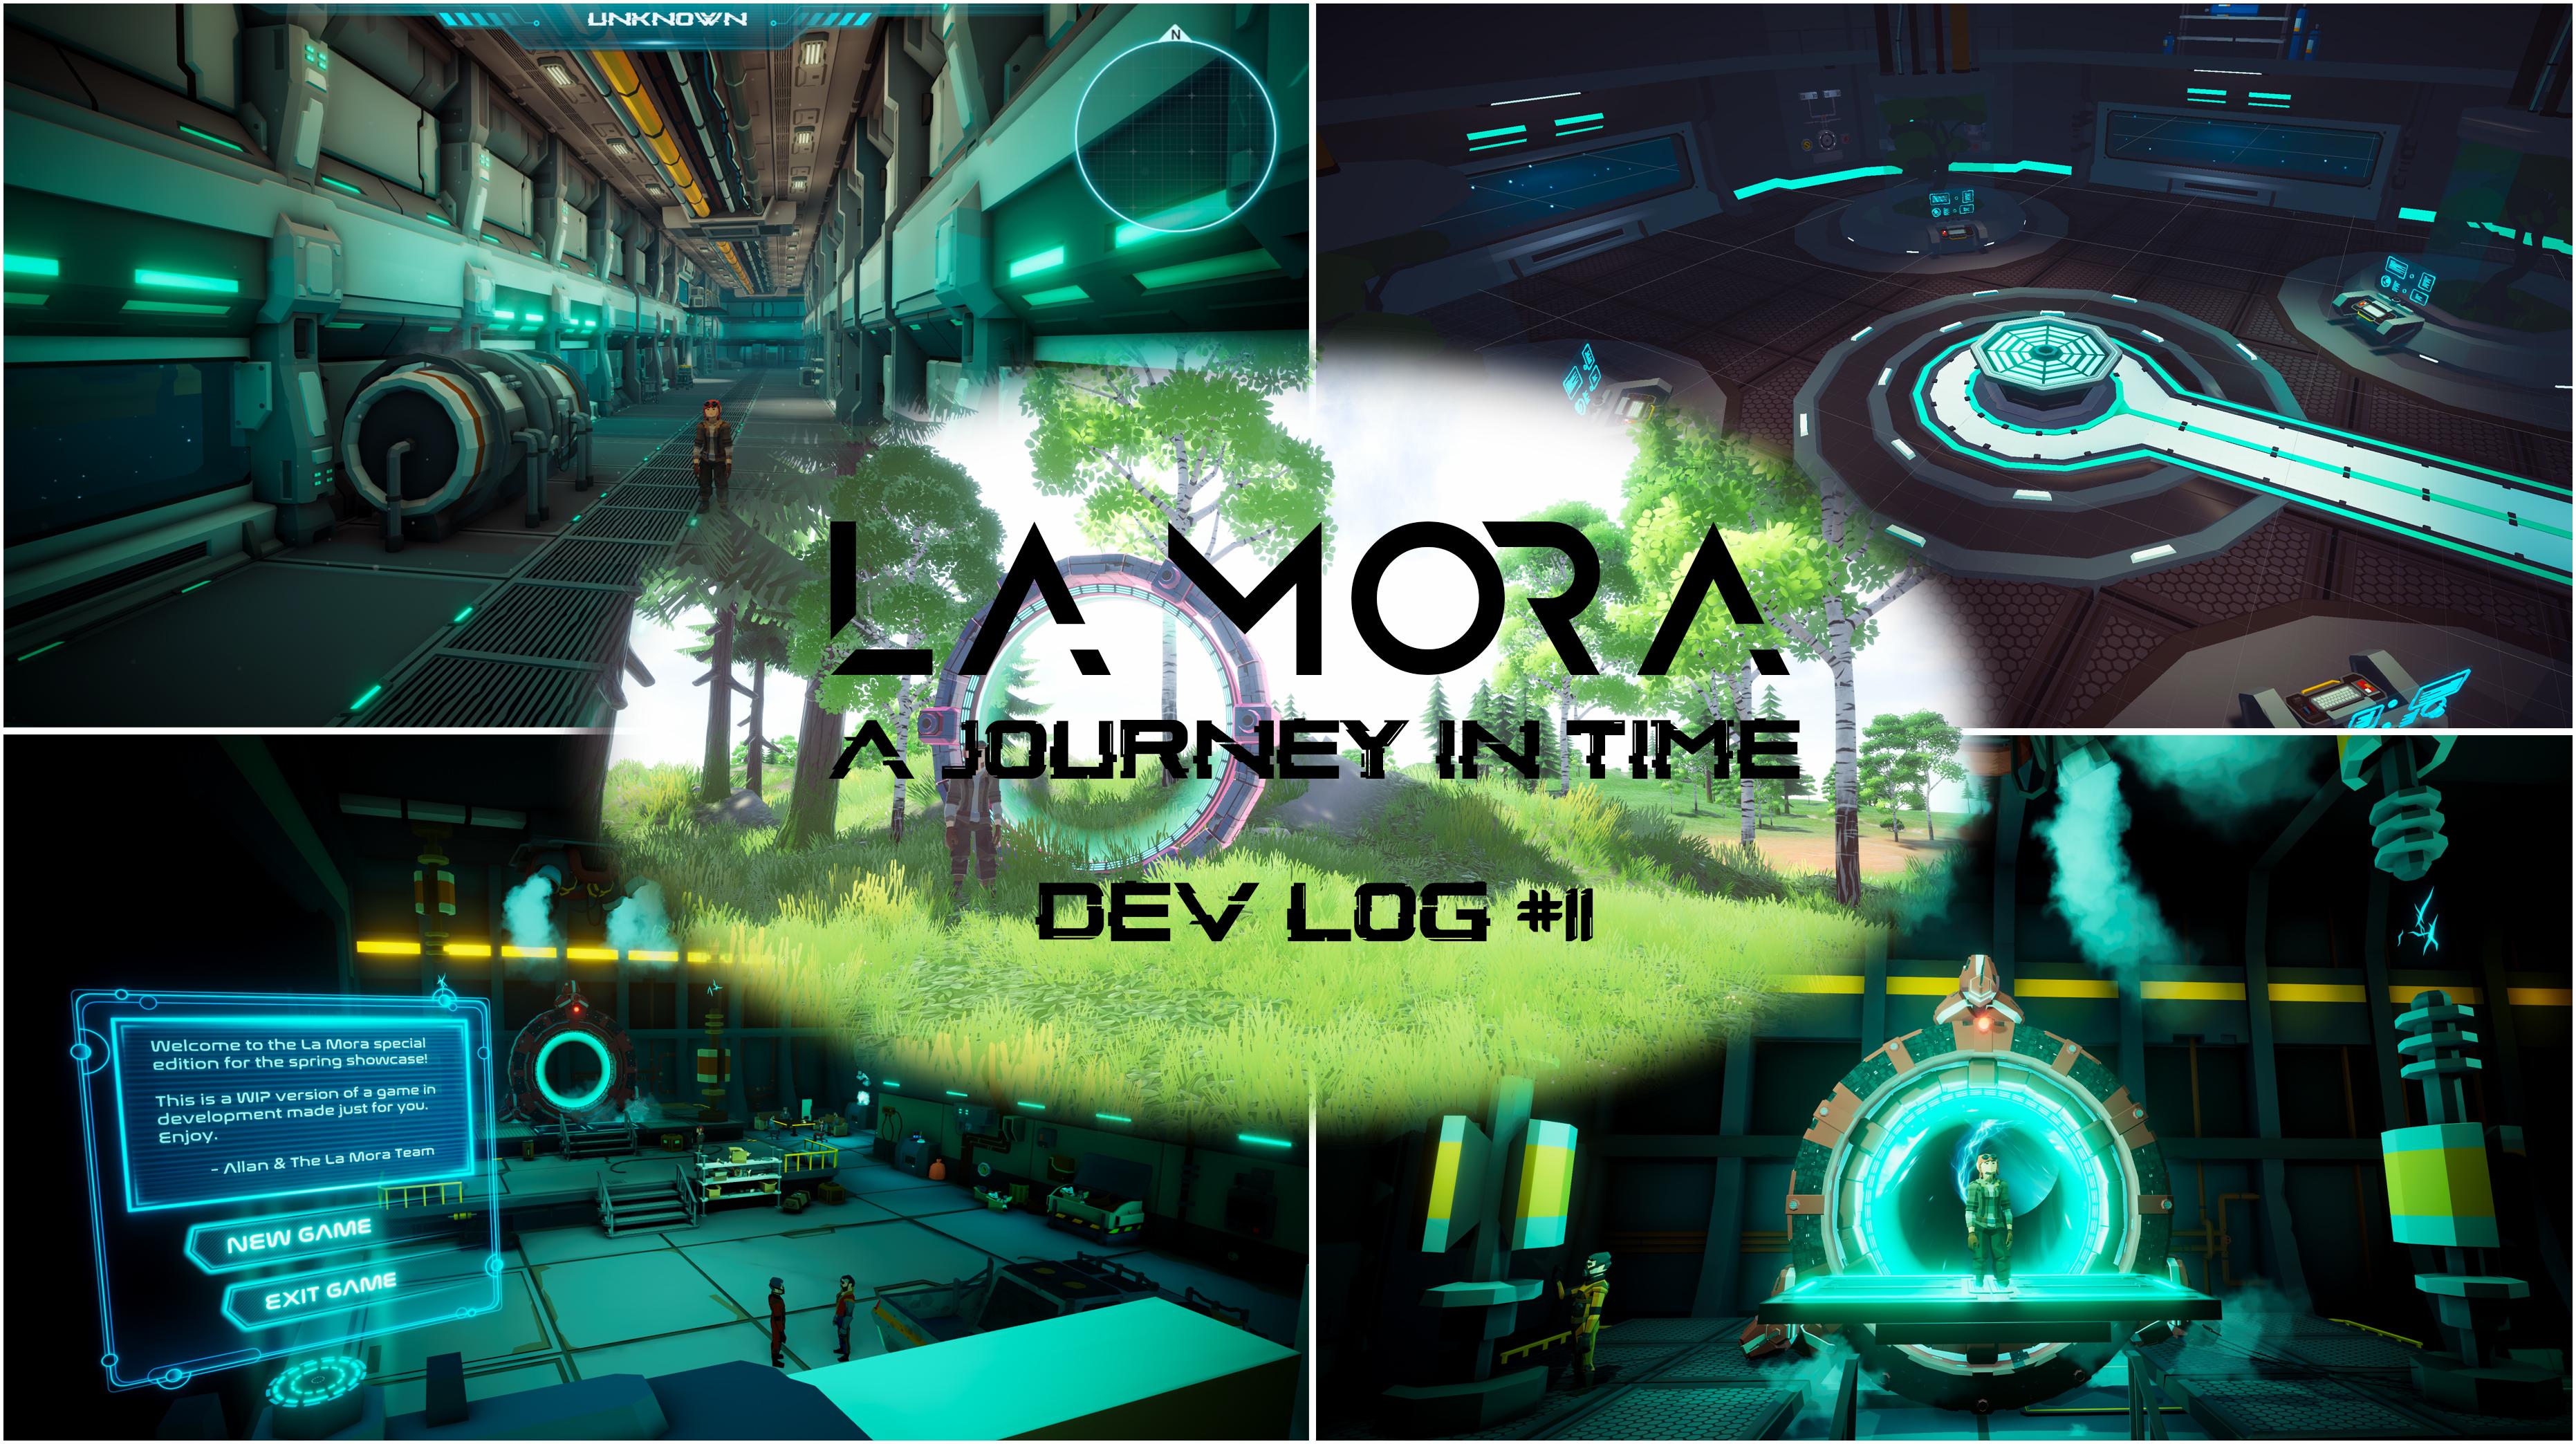 La Mora - A journey in time